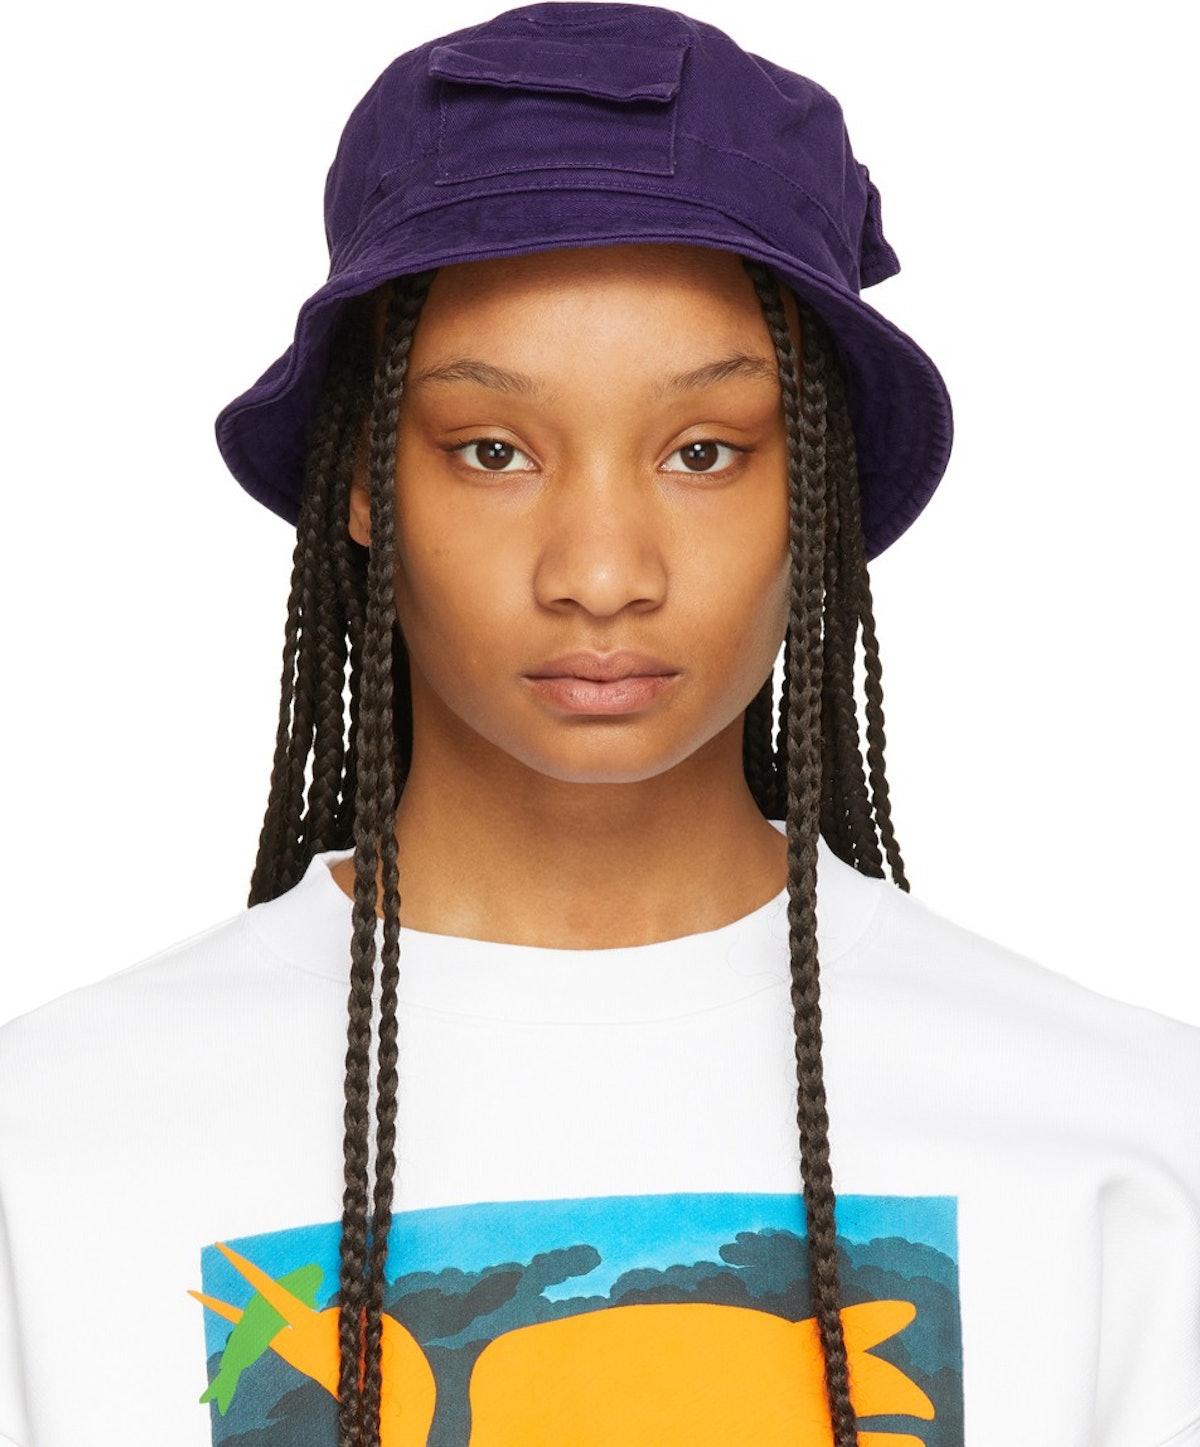 heron preston Purple Twill Bucket Hat